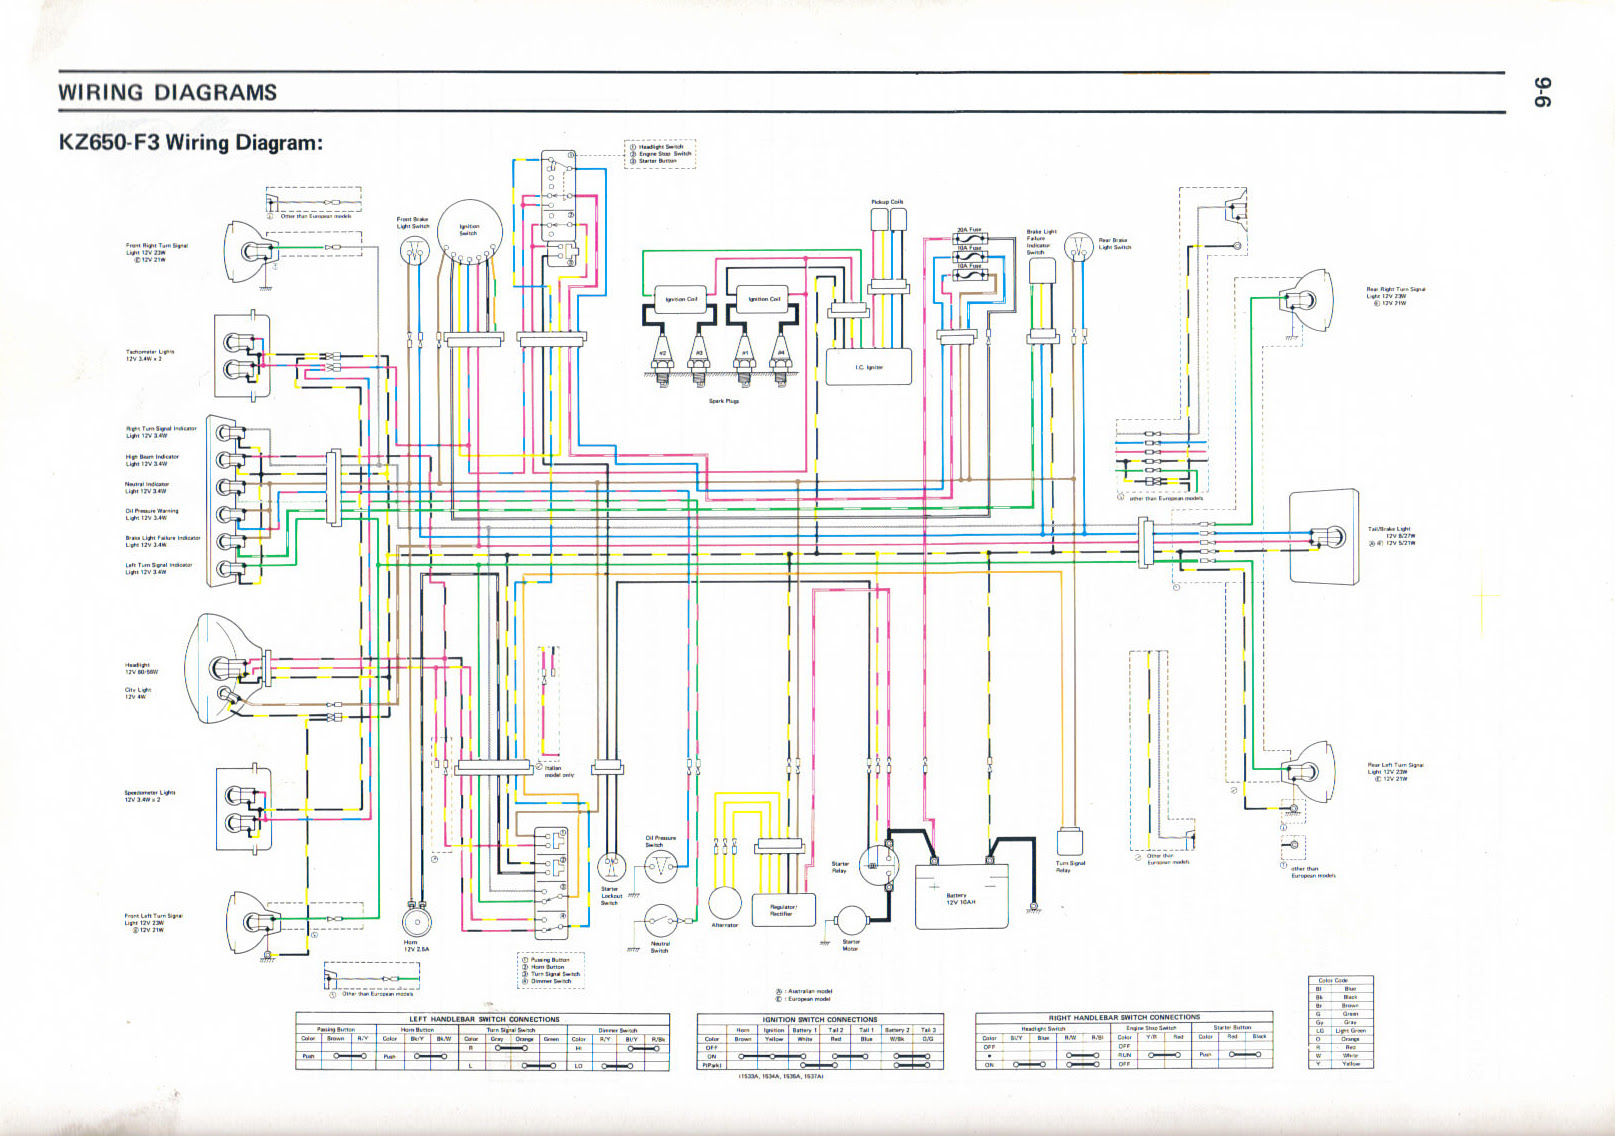 Citroen C2 Wiring Diagram Pdf - Wiring Diagrams Name lush-reason -  lush-reason.illabirintodellacreativita.it | Citroen C2 Wiring Diagram Pdf |  | illabirintodellacreativita.it